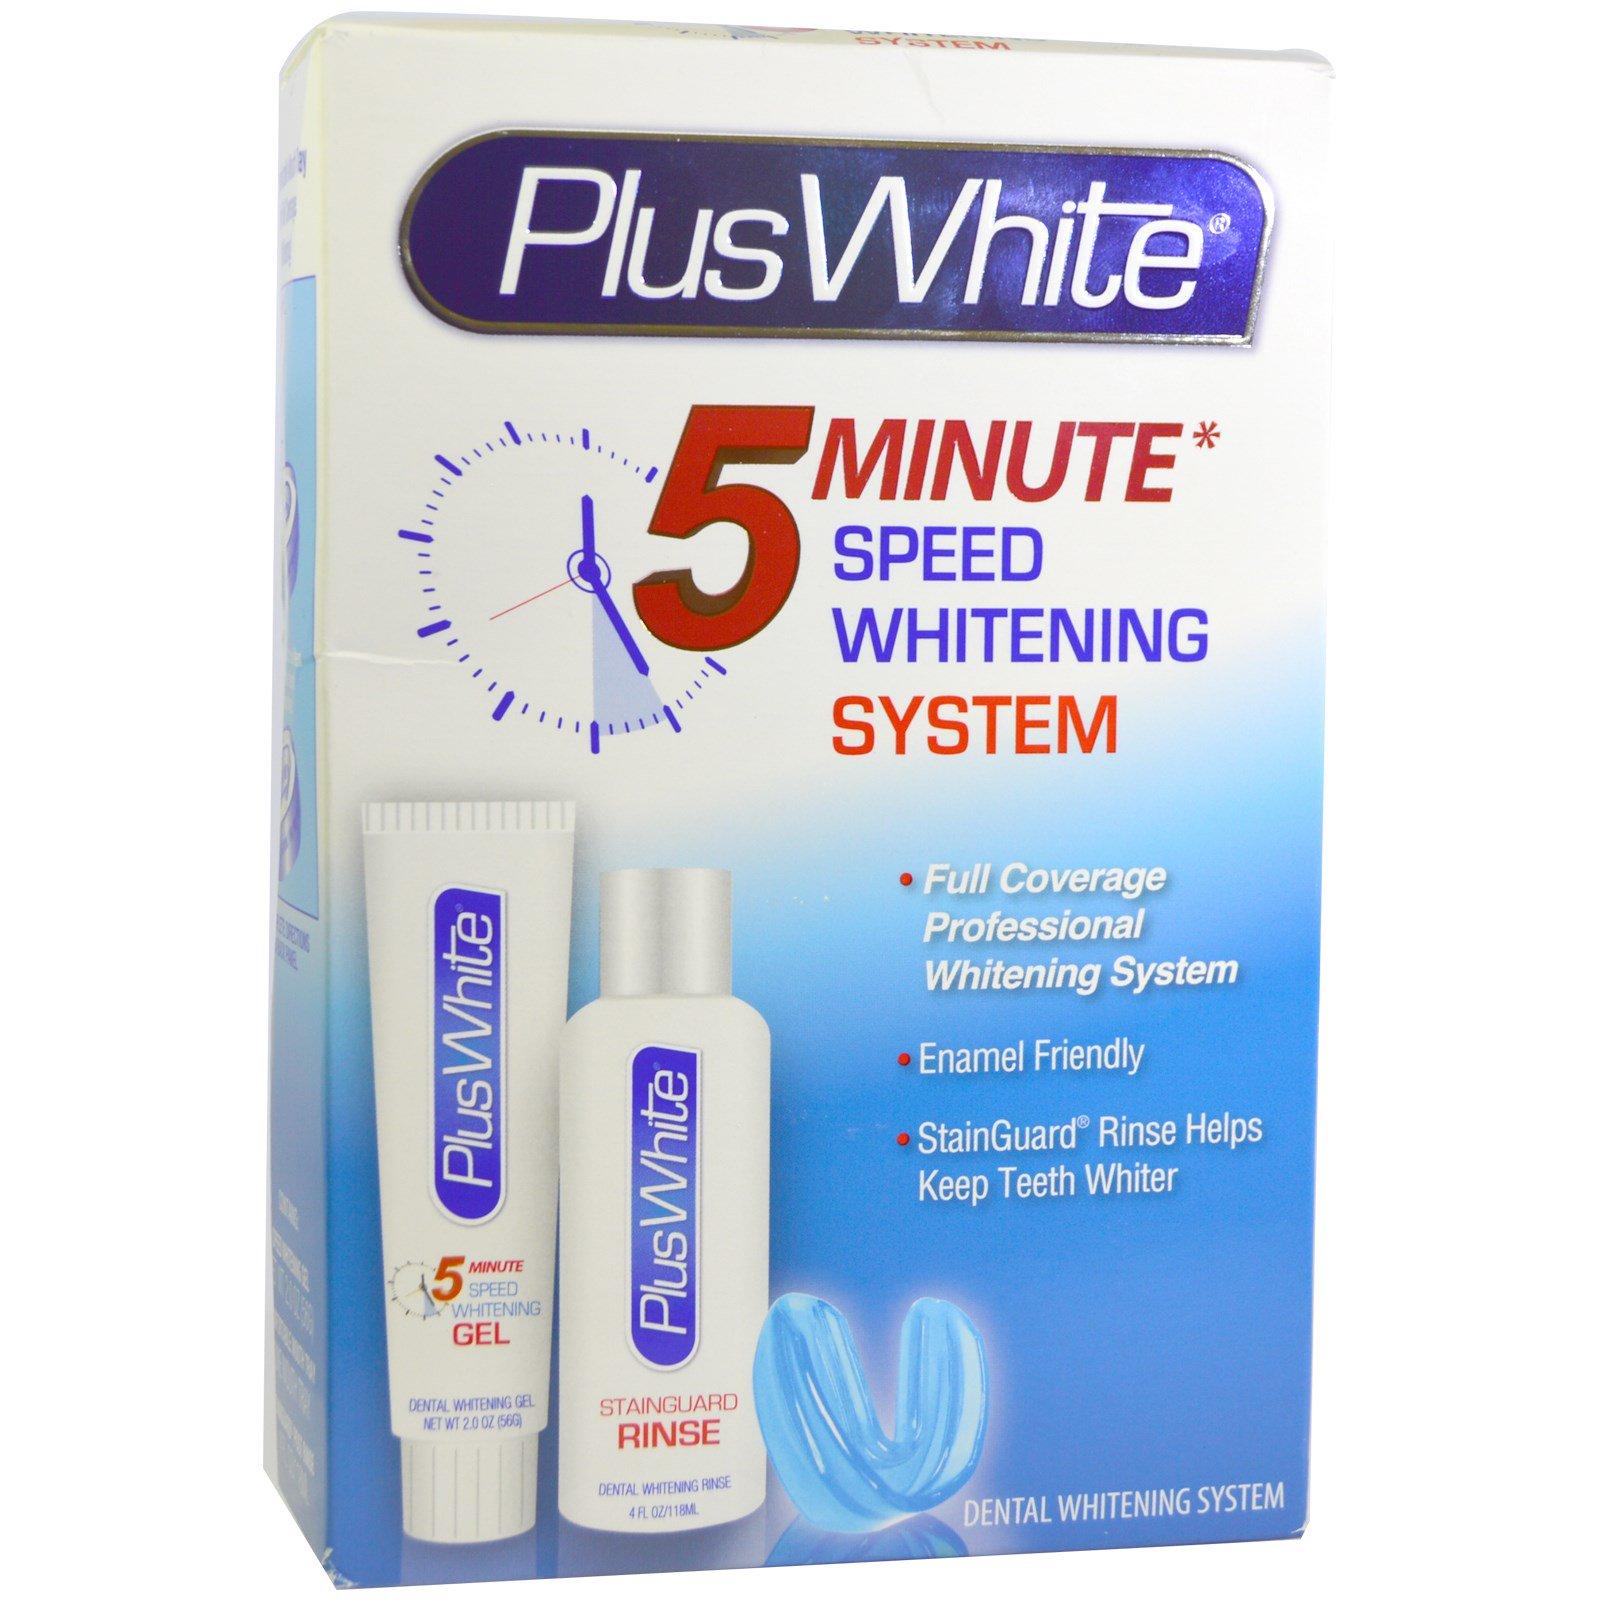 Plus White, 5 Minute Premier Whitening System, 3 Piece Whitening Kit ...